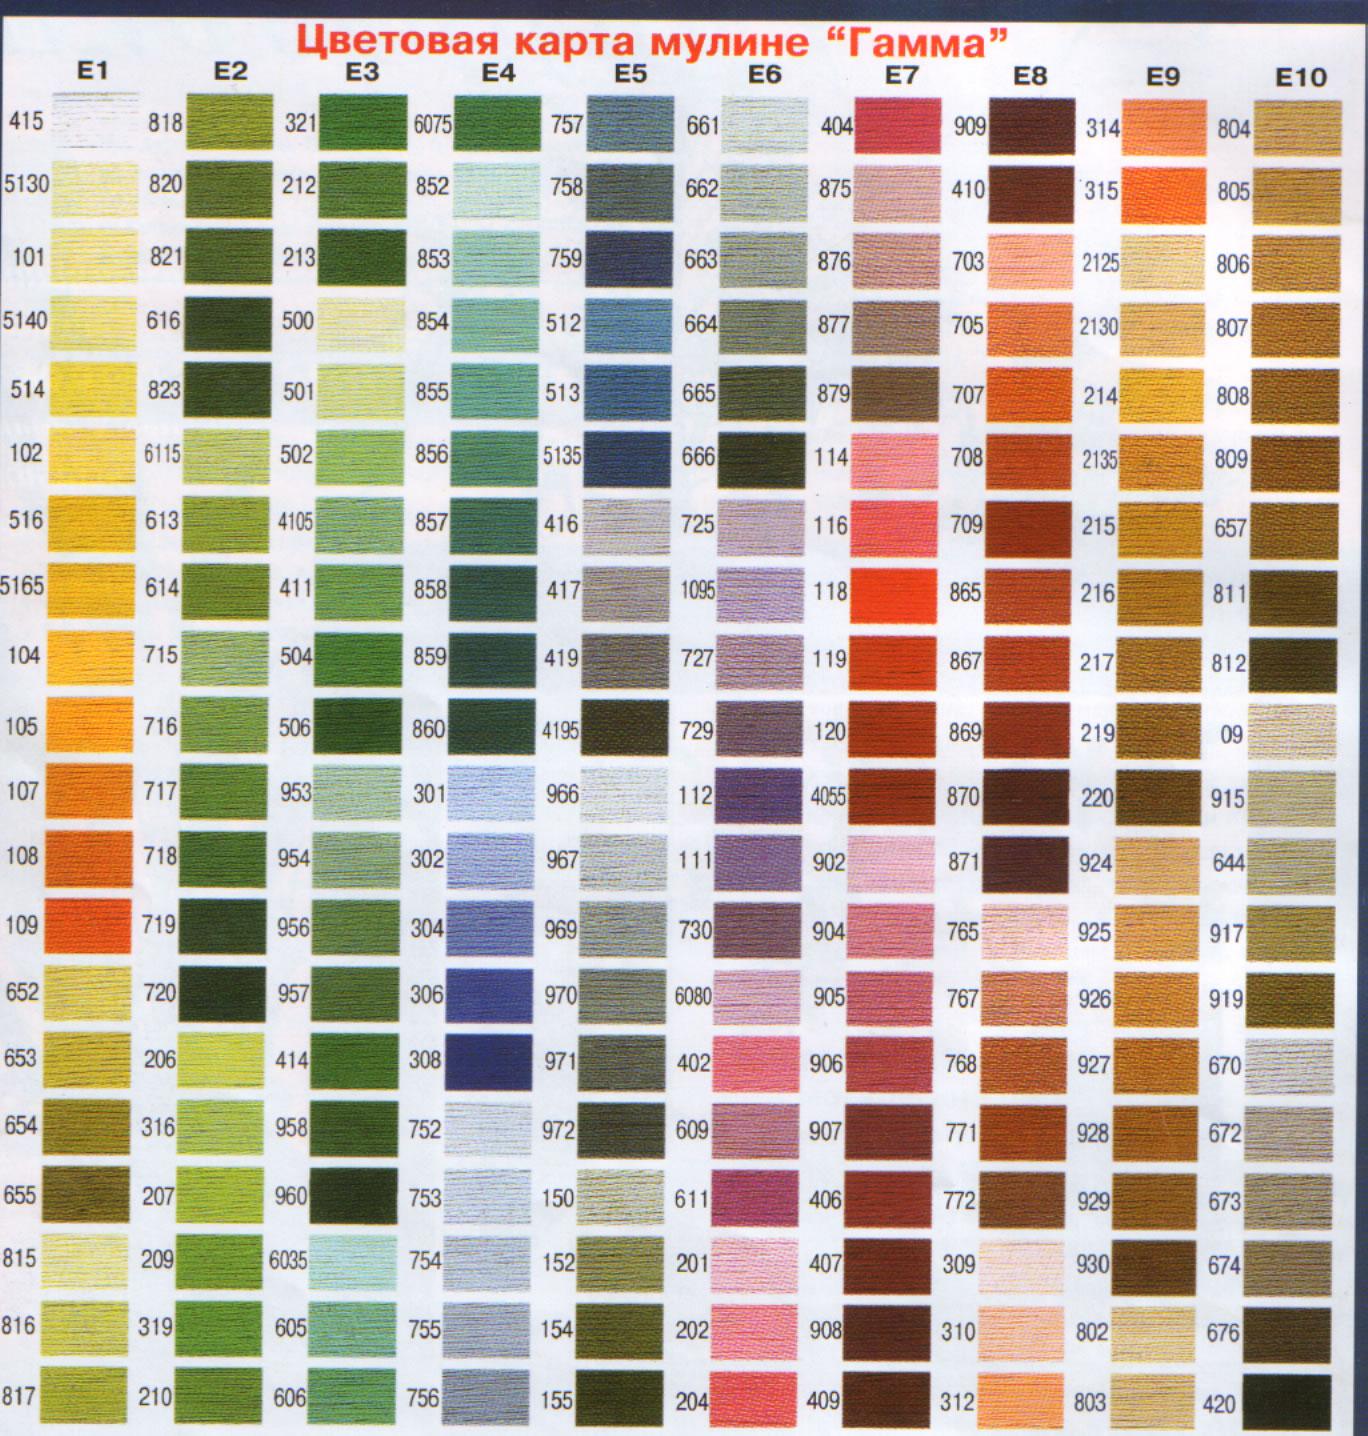 Карта цветов ниток вышивки